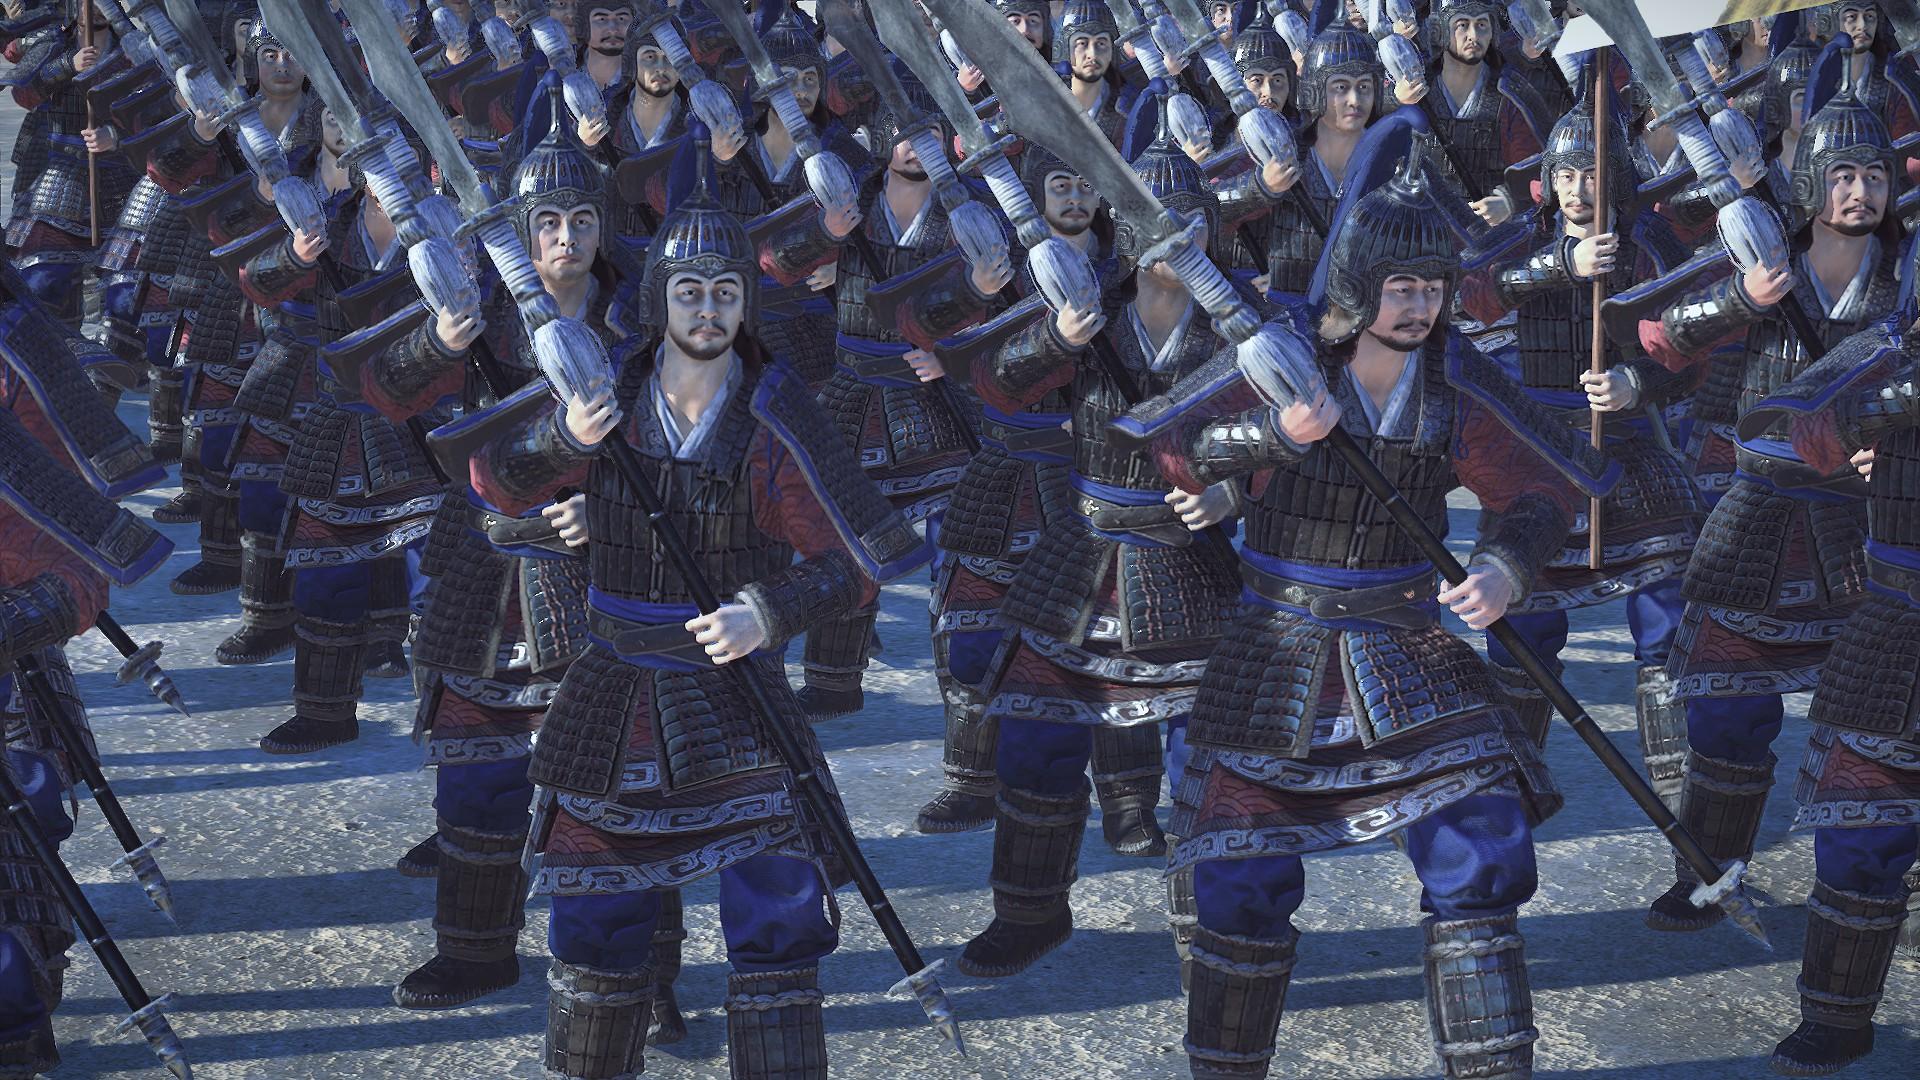 Mod] * Better Looking Units * sur le forum Total War : Three